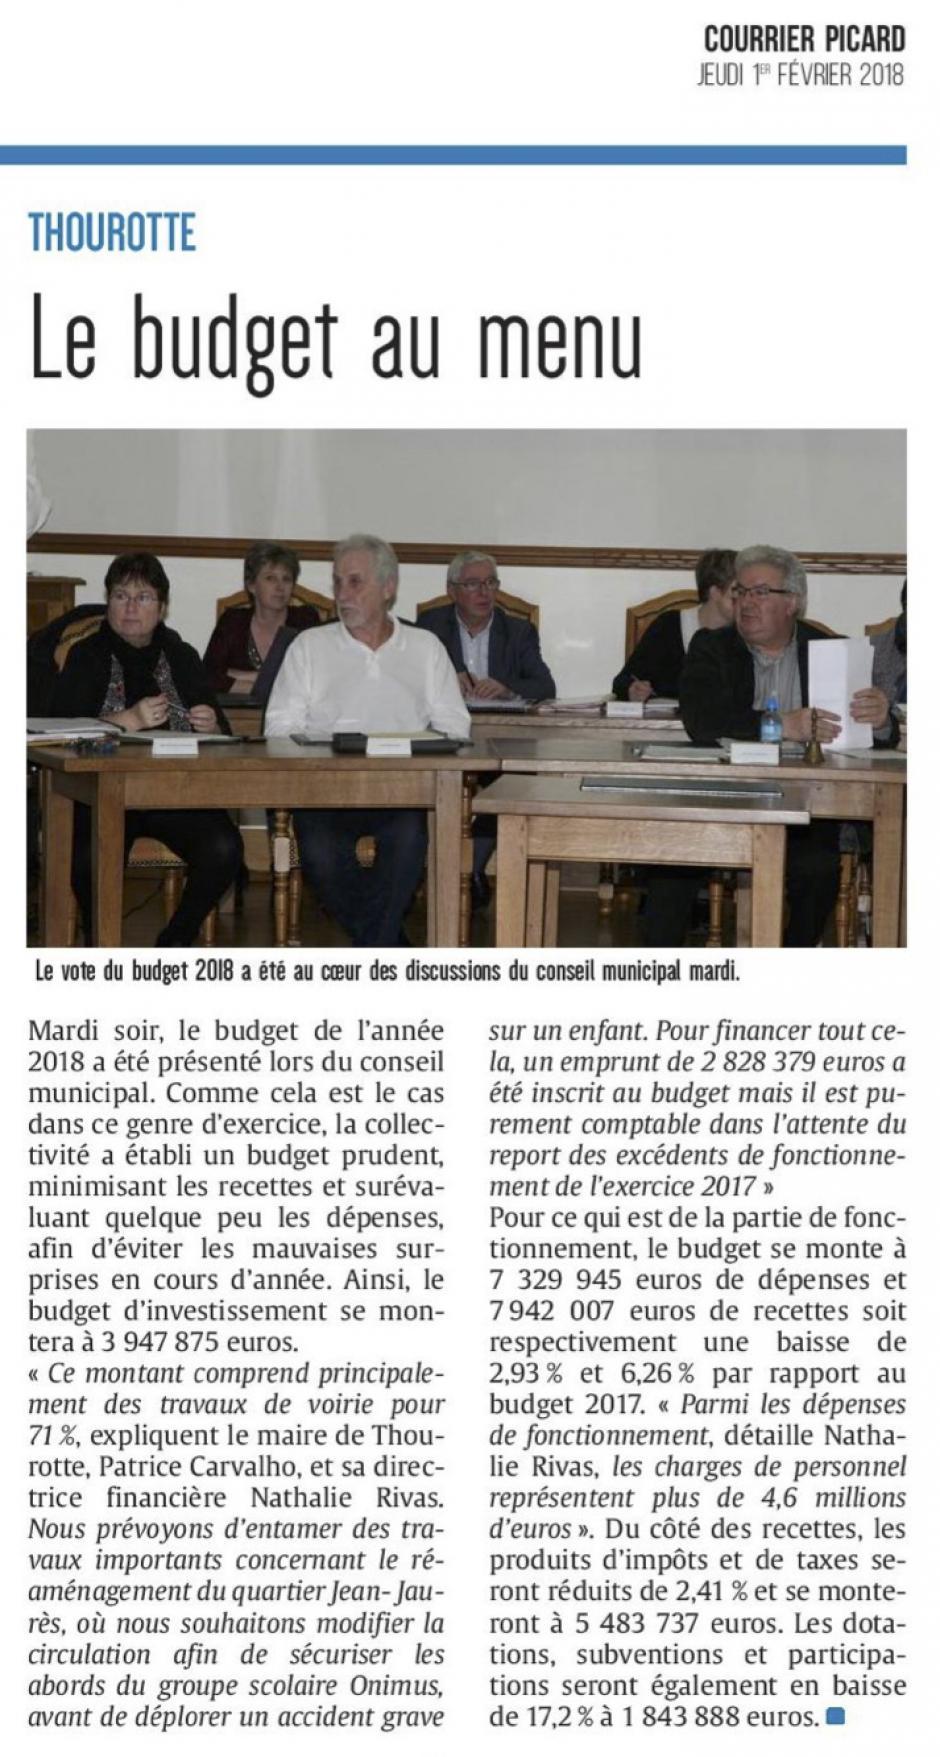 20180201-CP-Thourotte-Le budget au menu